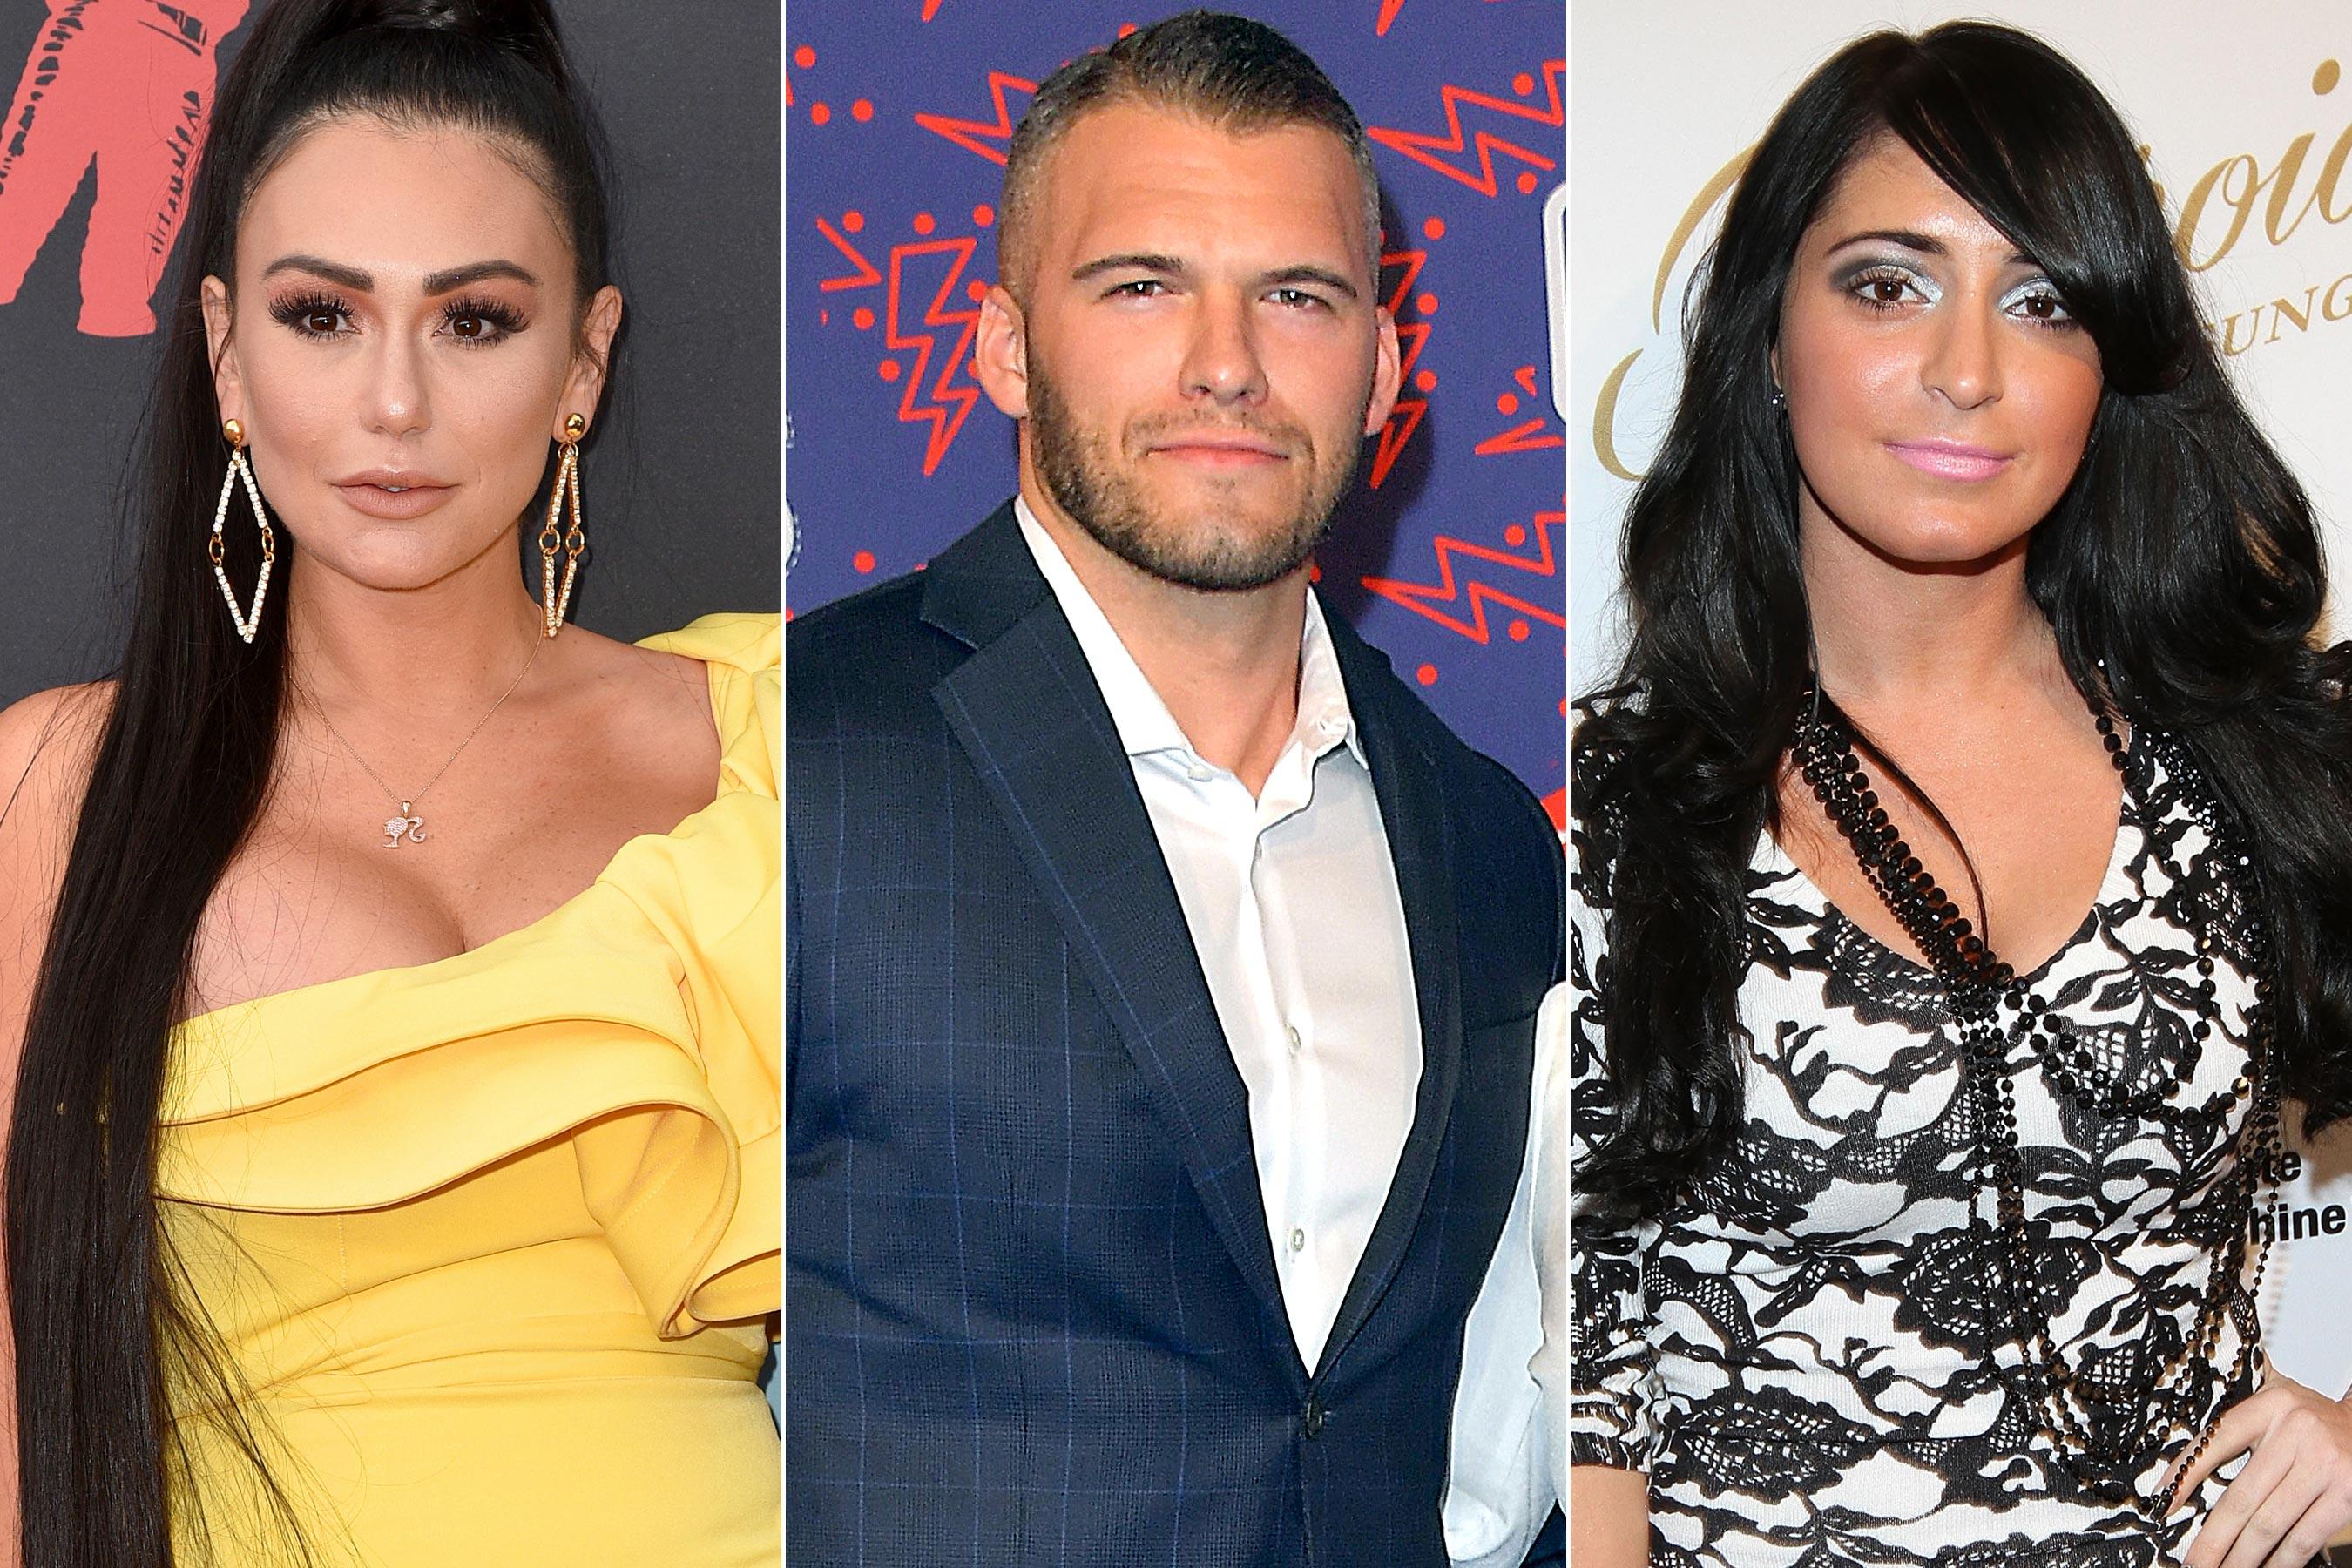 JWoww Is 'Hurt' As Boyfriend Zack Carpinello Make a Move on Angelina Pivarnick